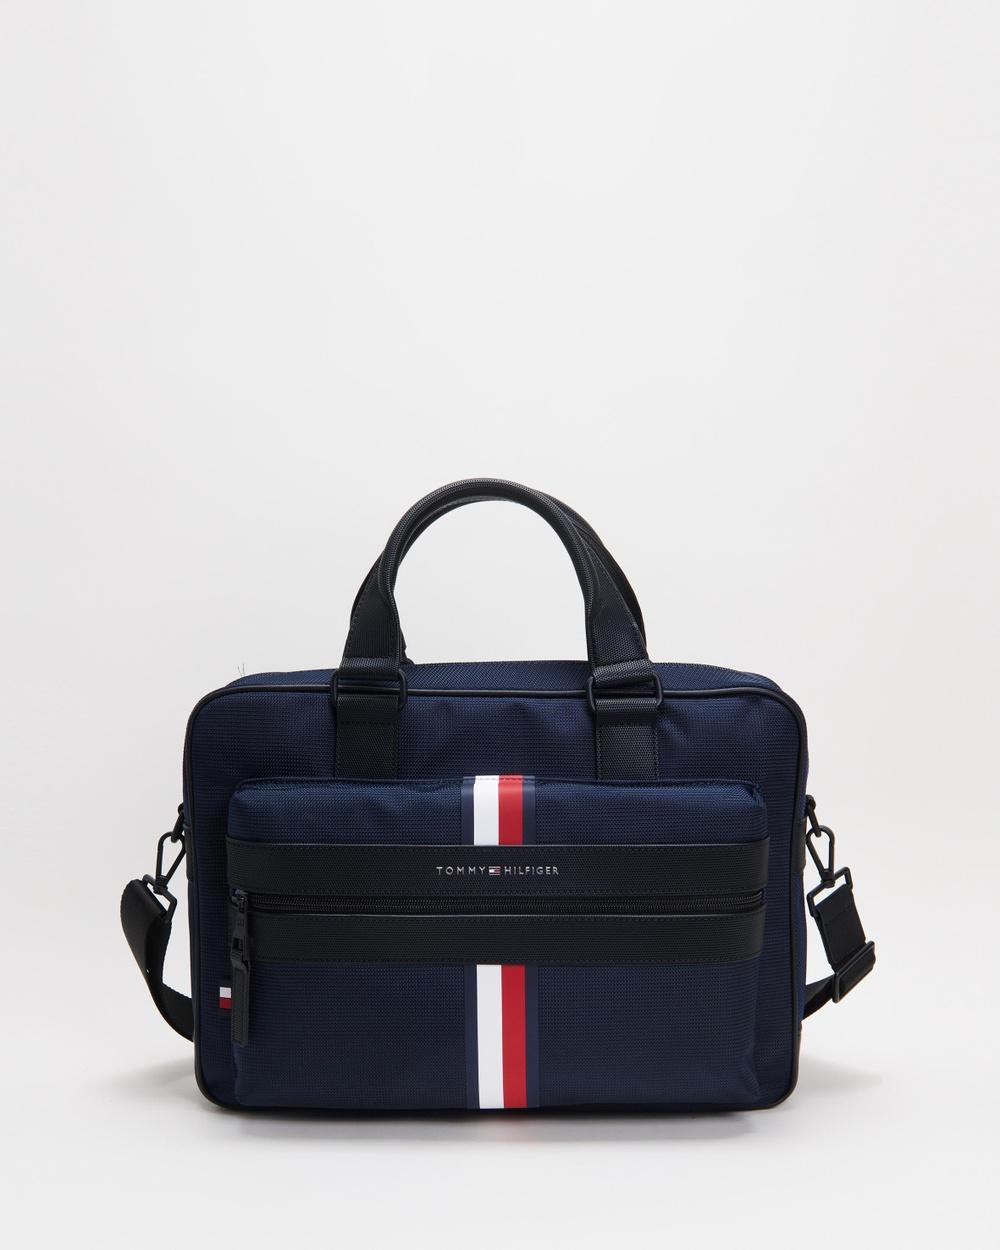 Tommy Hilfiger Elevated Nylon Computer Bag Bags Desert Sky Australia